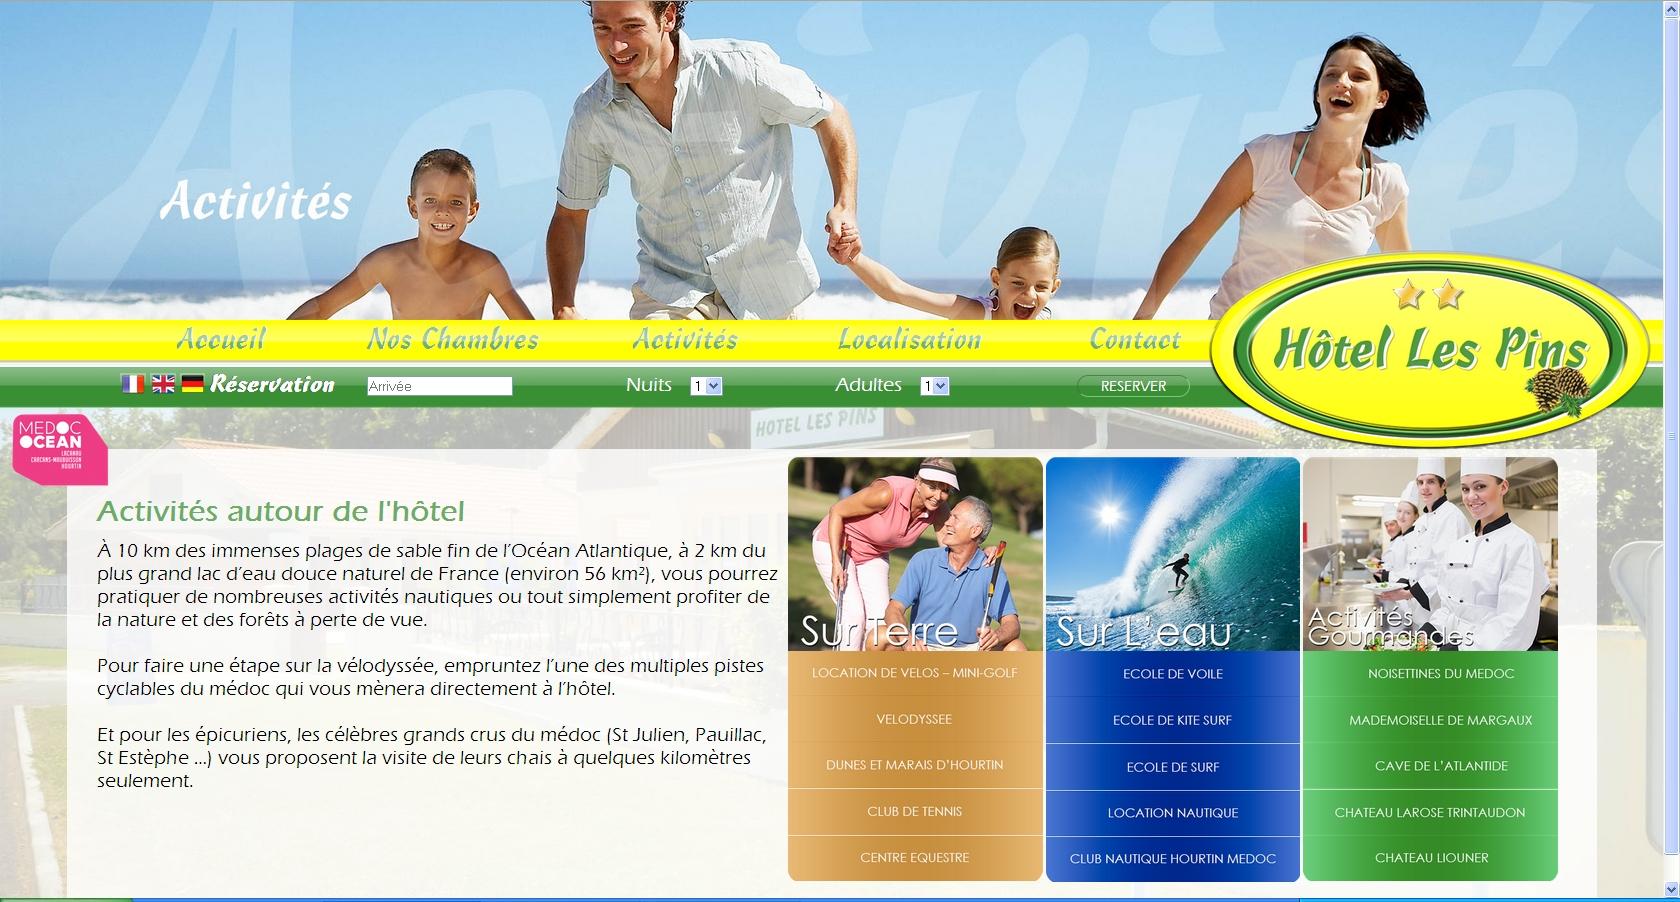 http://naytheet.fr/Web/images/reas/HtelLesPins5.jpg